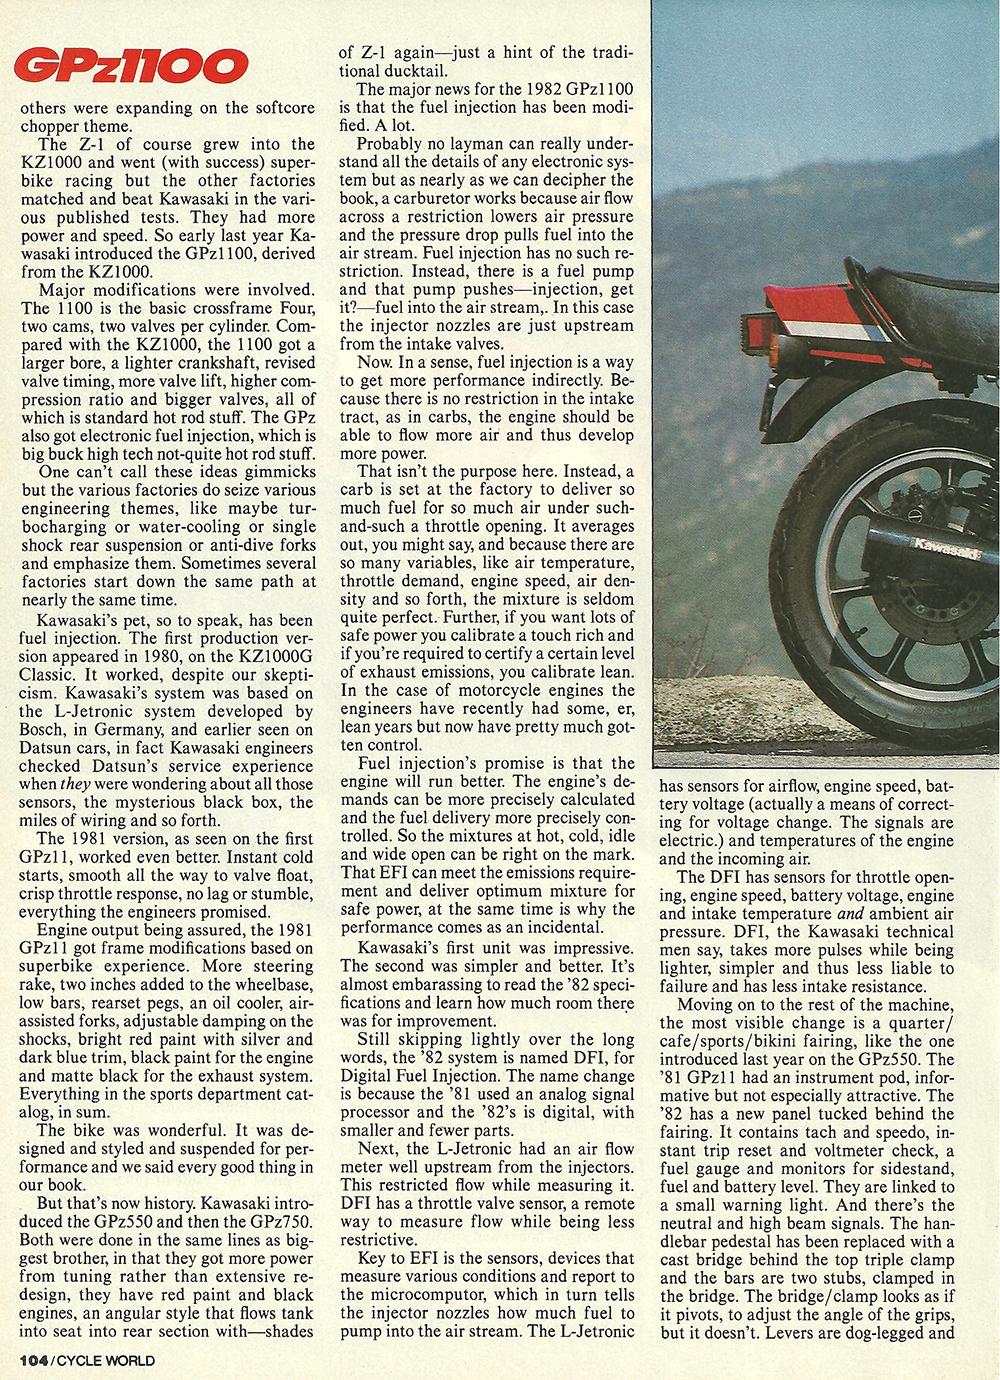 1982 Kawasaki GPz1100 road test 02.jpg